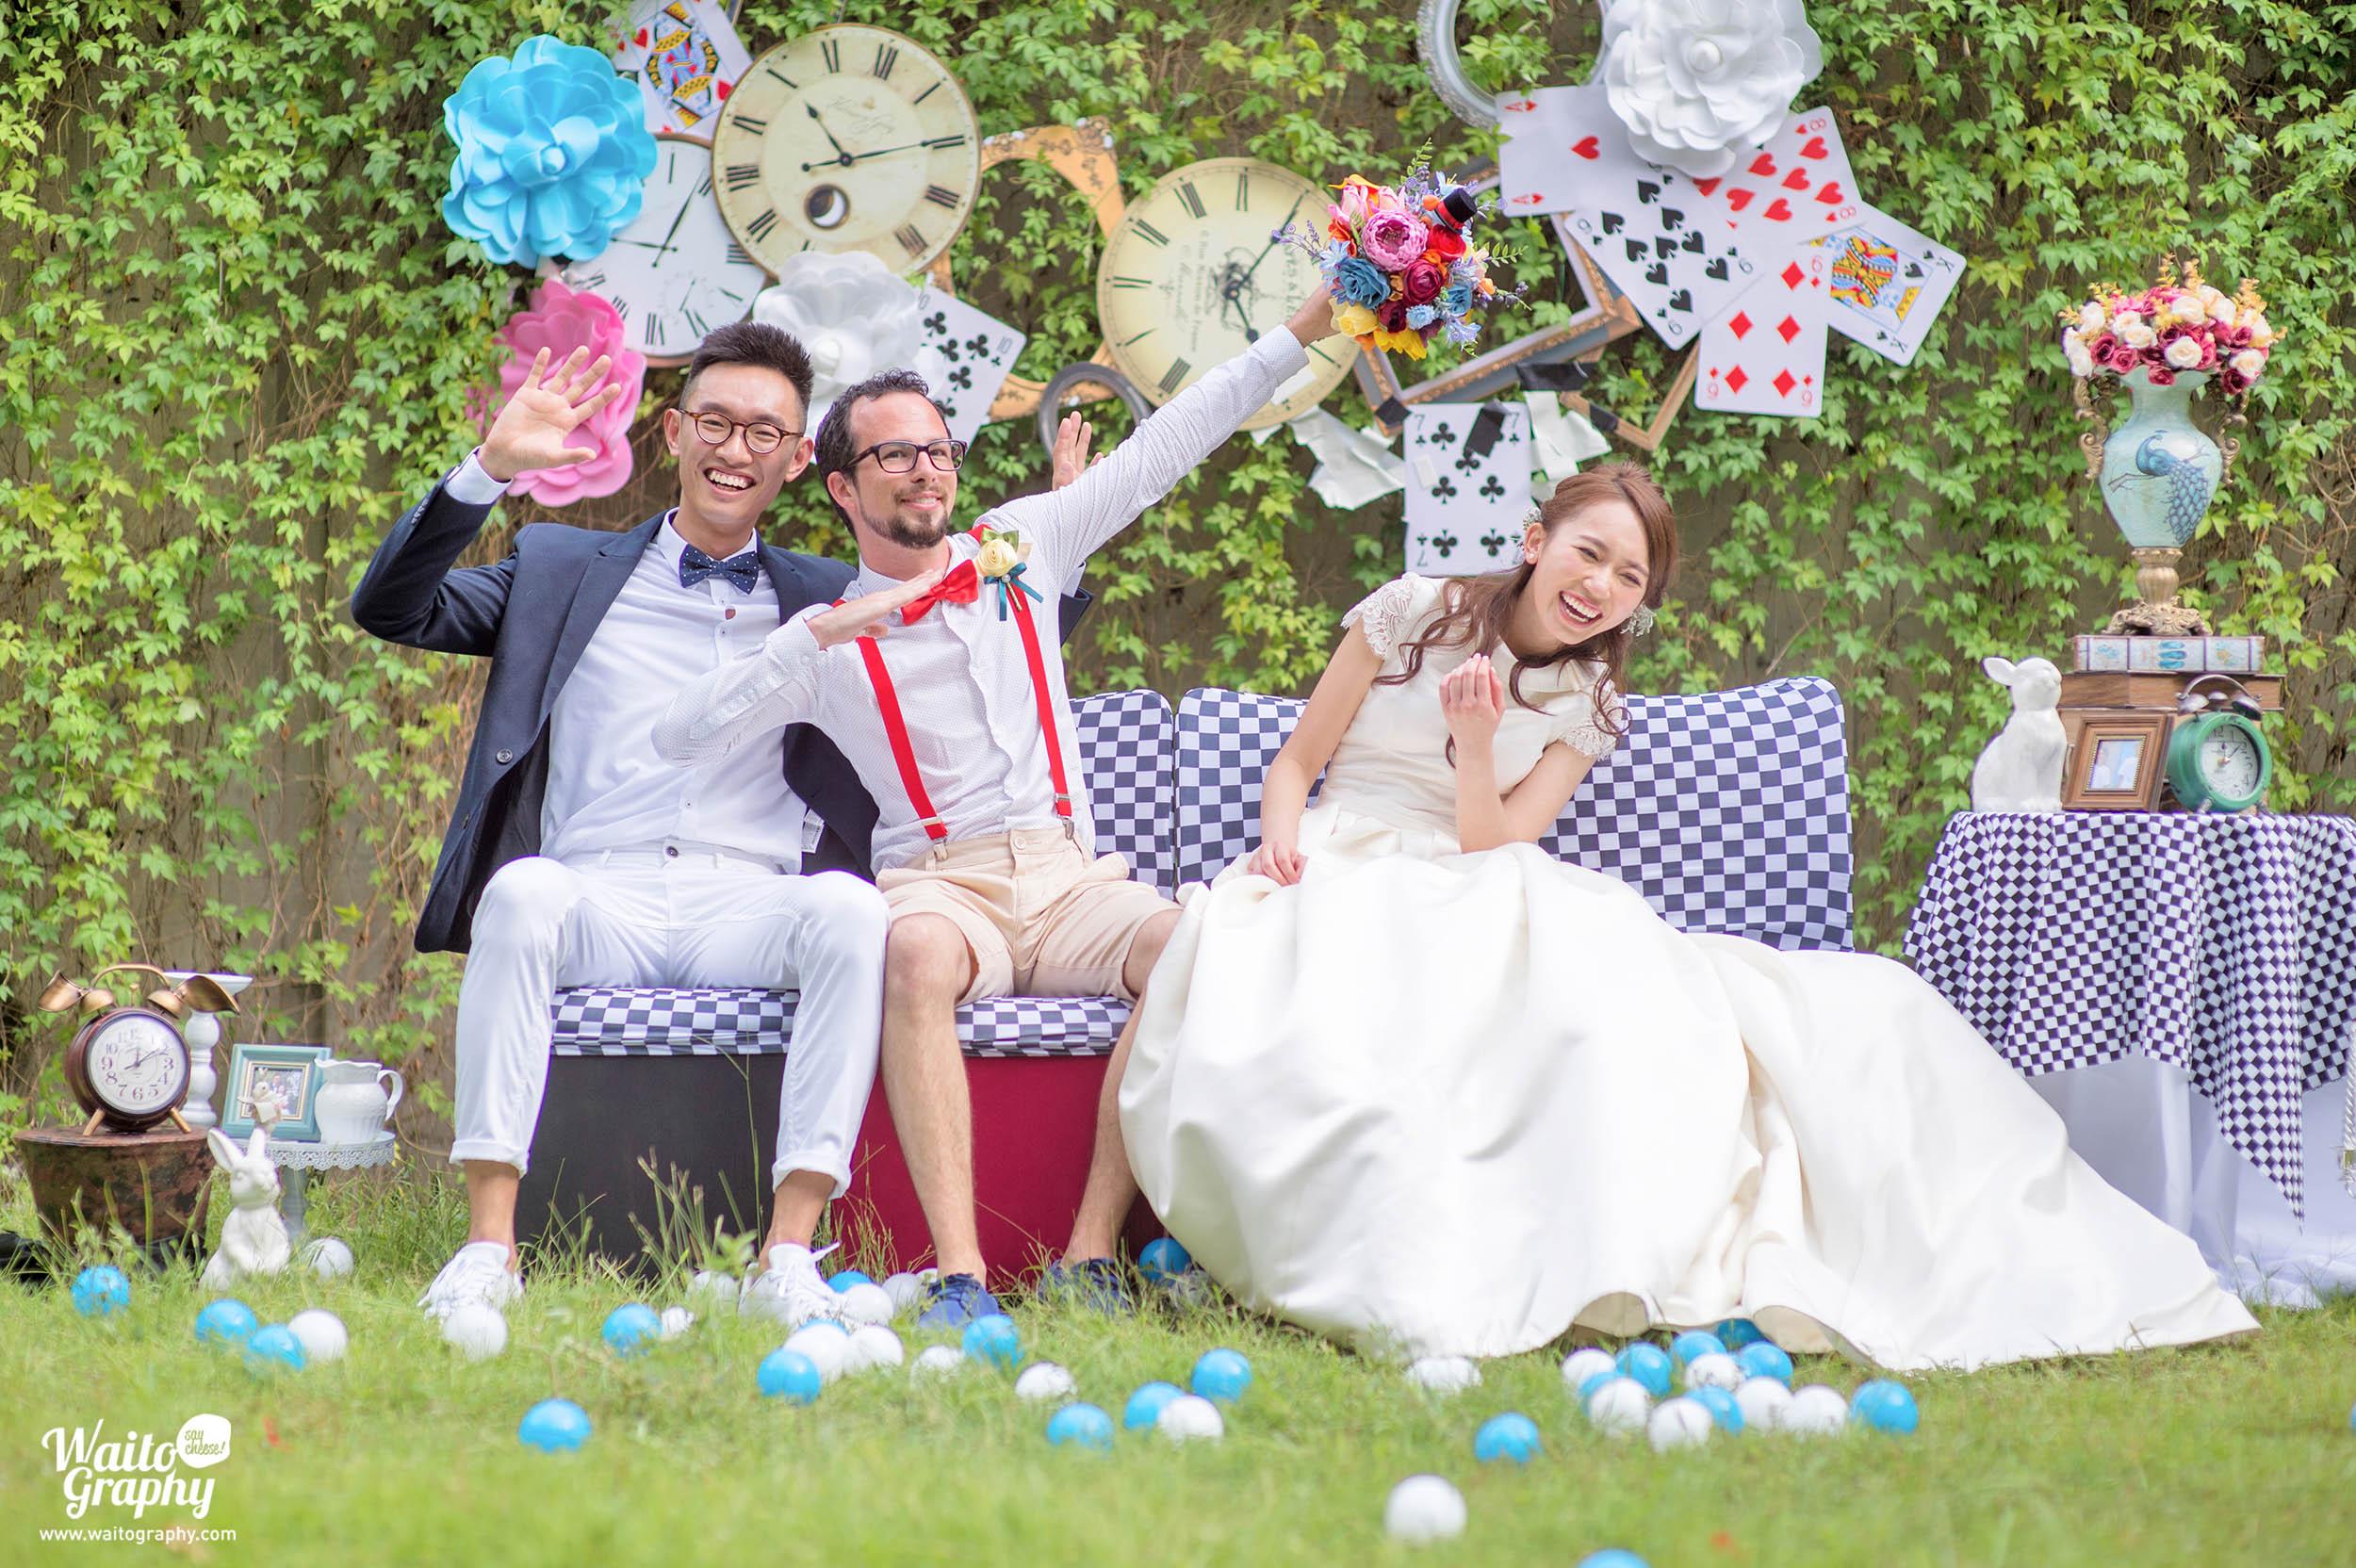 Ivy & David Wedding Day 零碳天地 HK Zero Carbon Building (ZCB)